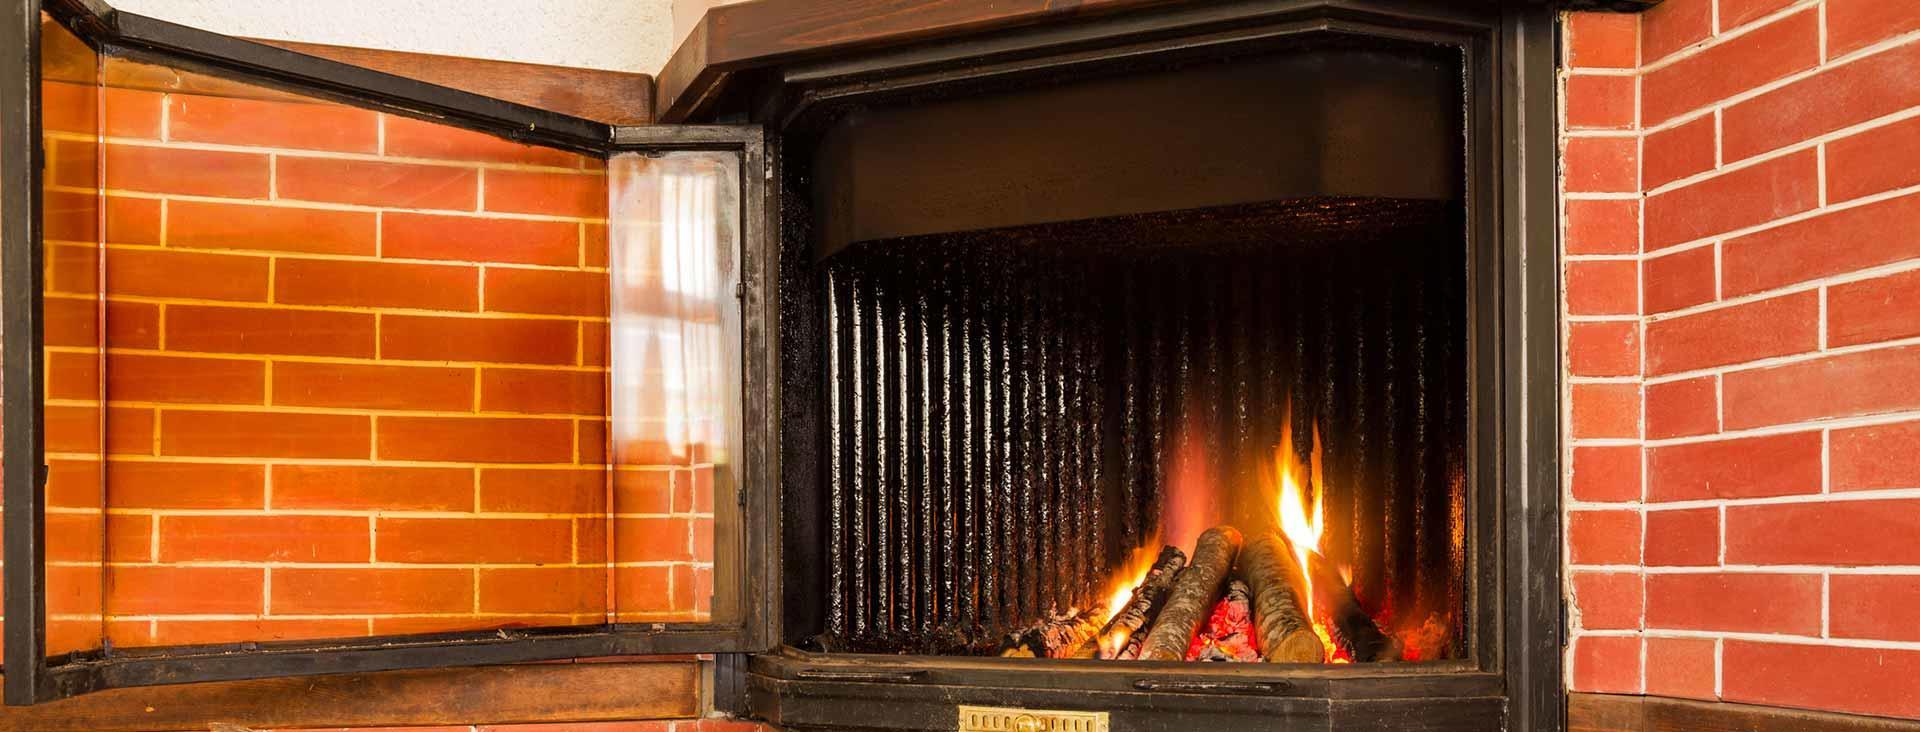 Air Express Heating & Air Conditioning image 4